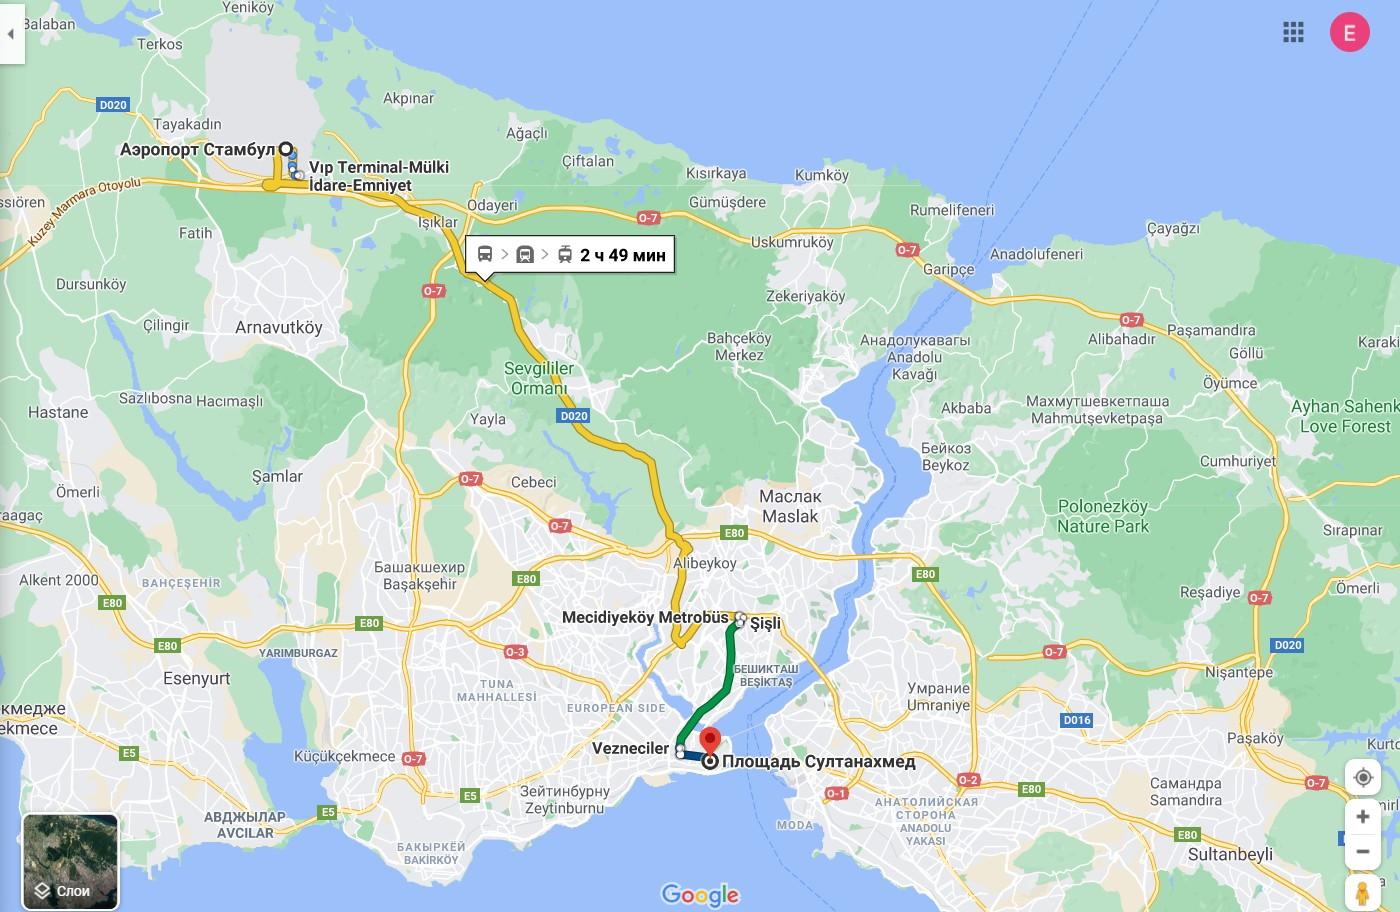 Из Нового аэропорта до площади Султанахмет на автобусе + метро